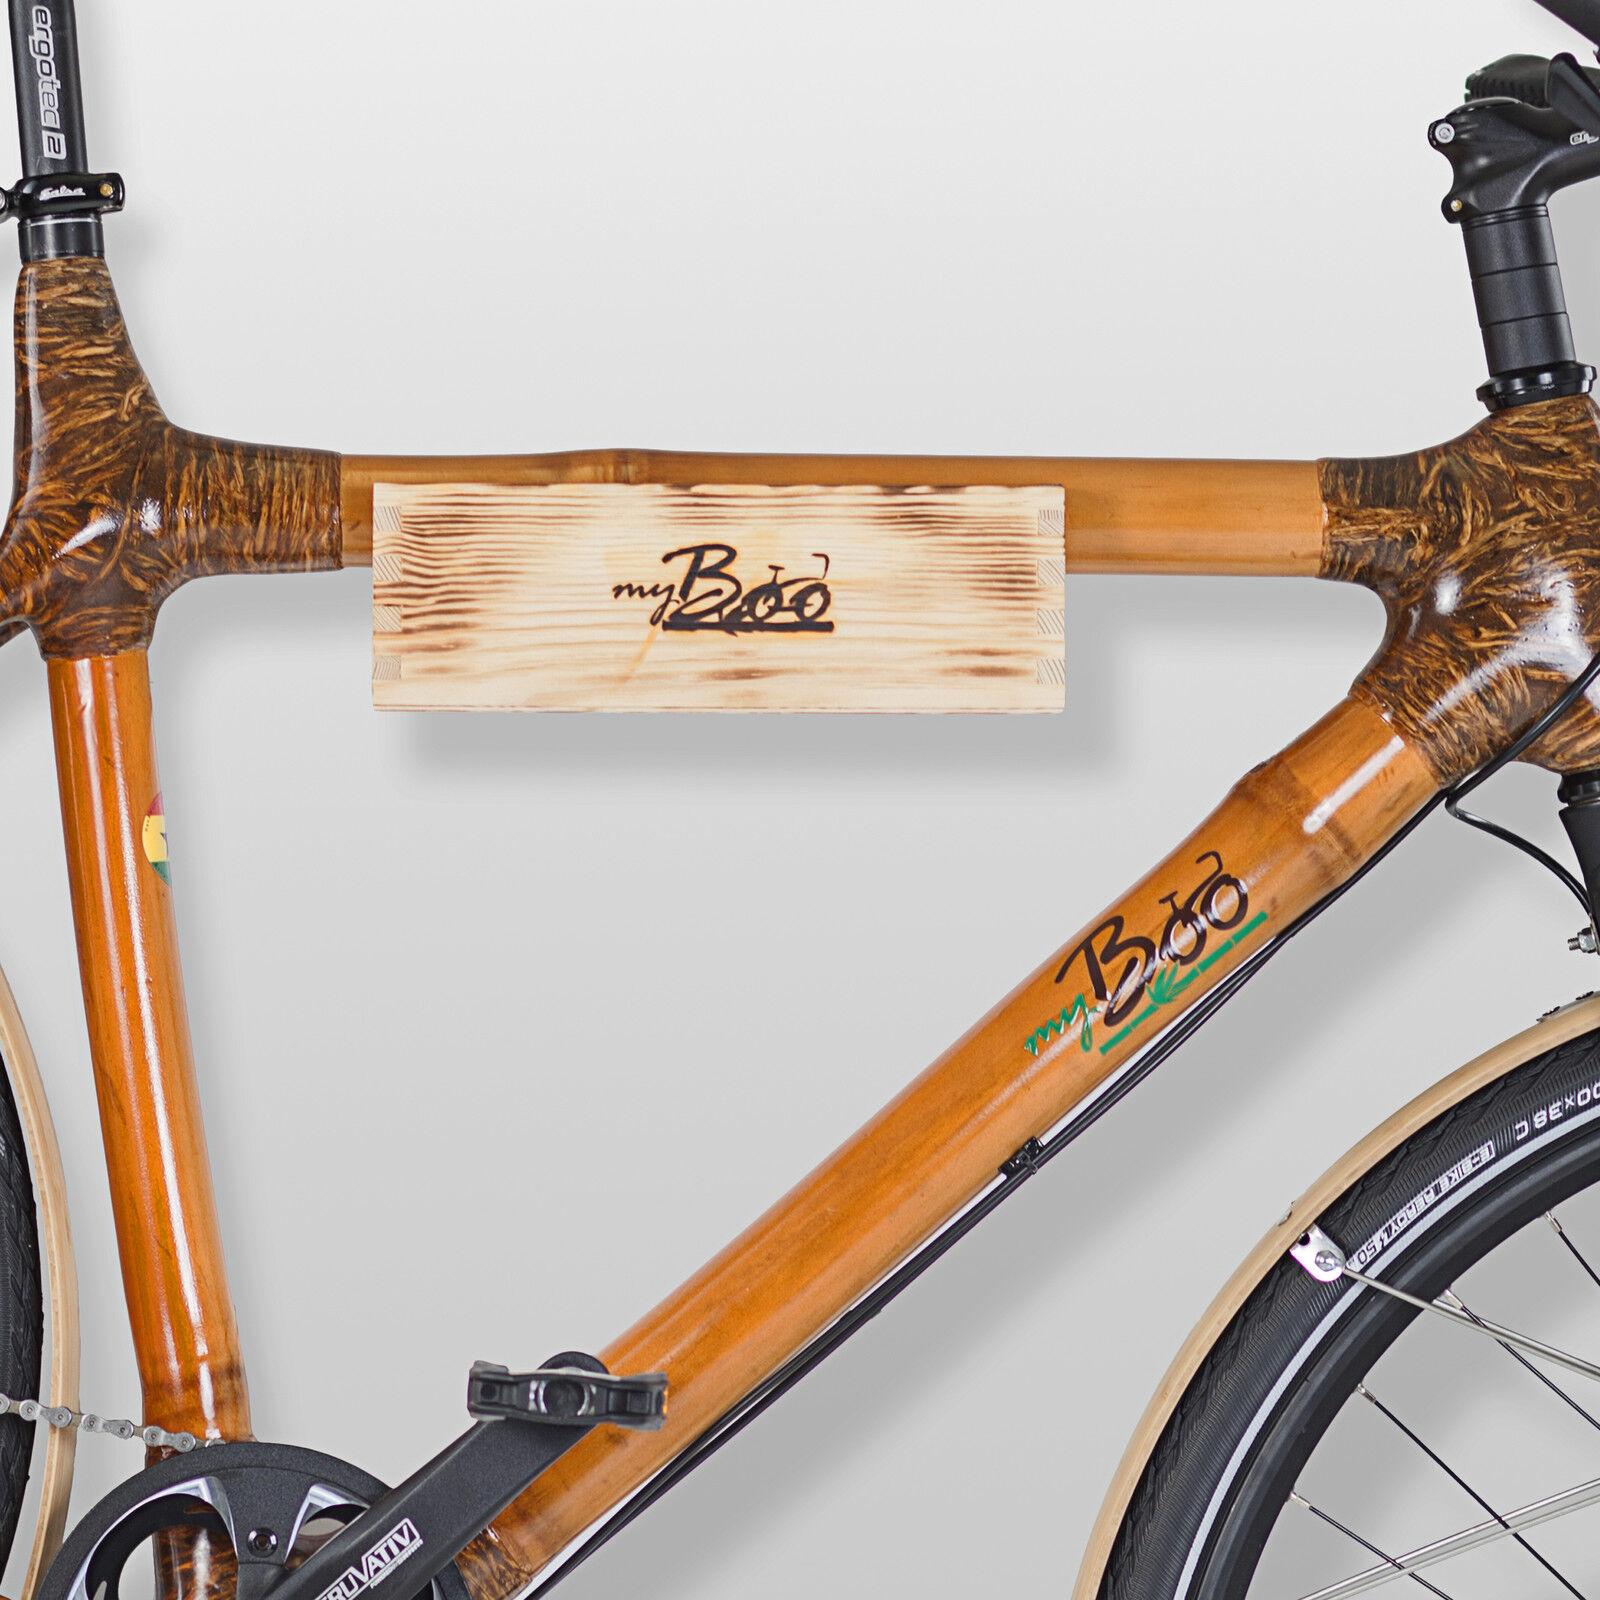 Fahrradwandhalterung Fahrradwandhalterung Fahrradwandhalterung aus Holz und Leder für Fahrräder - Halterung Holz Fahrrad 1eb2a6